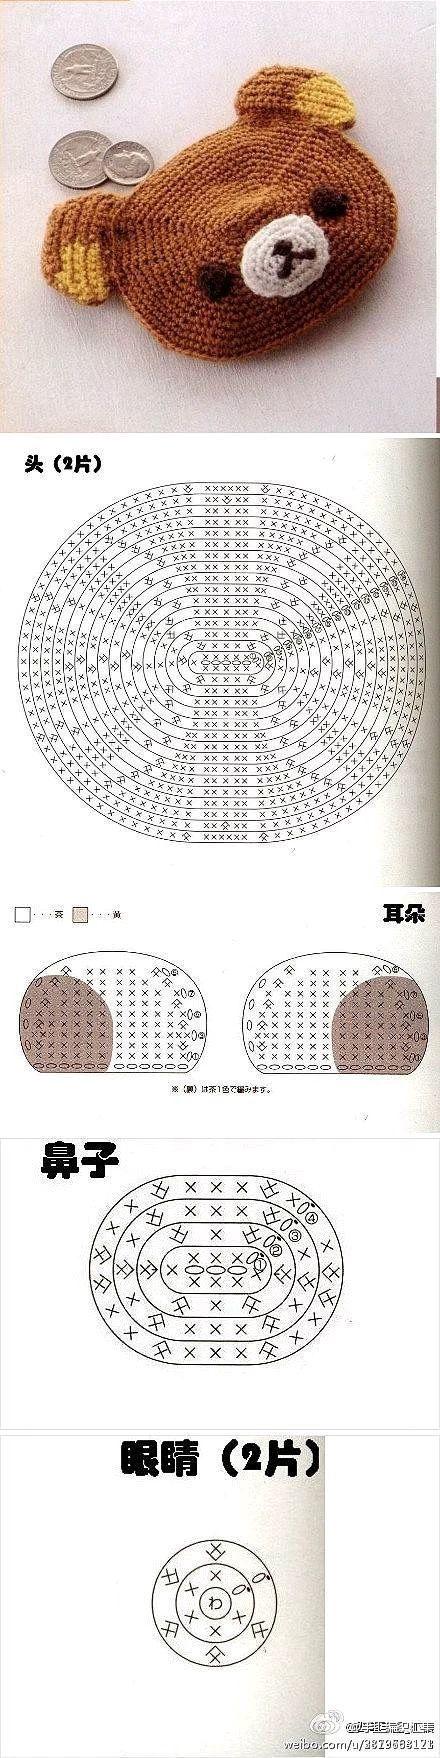 crochet rib stitch instructions